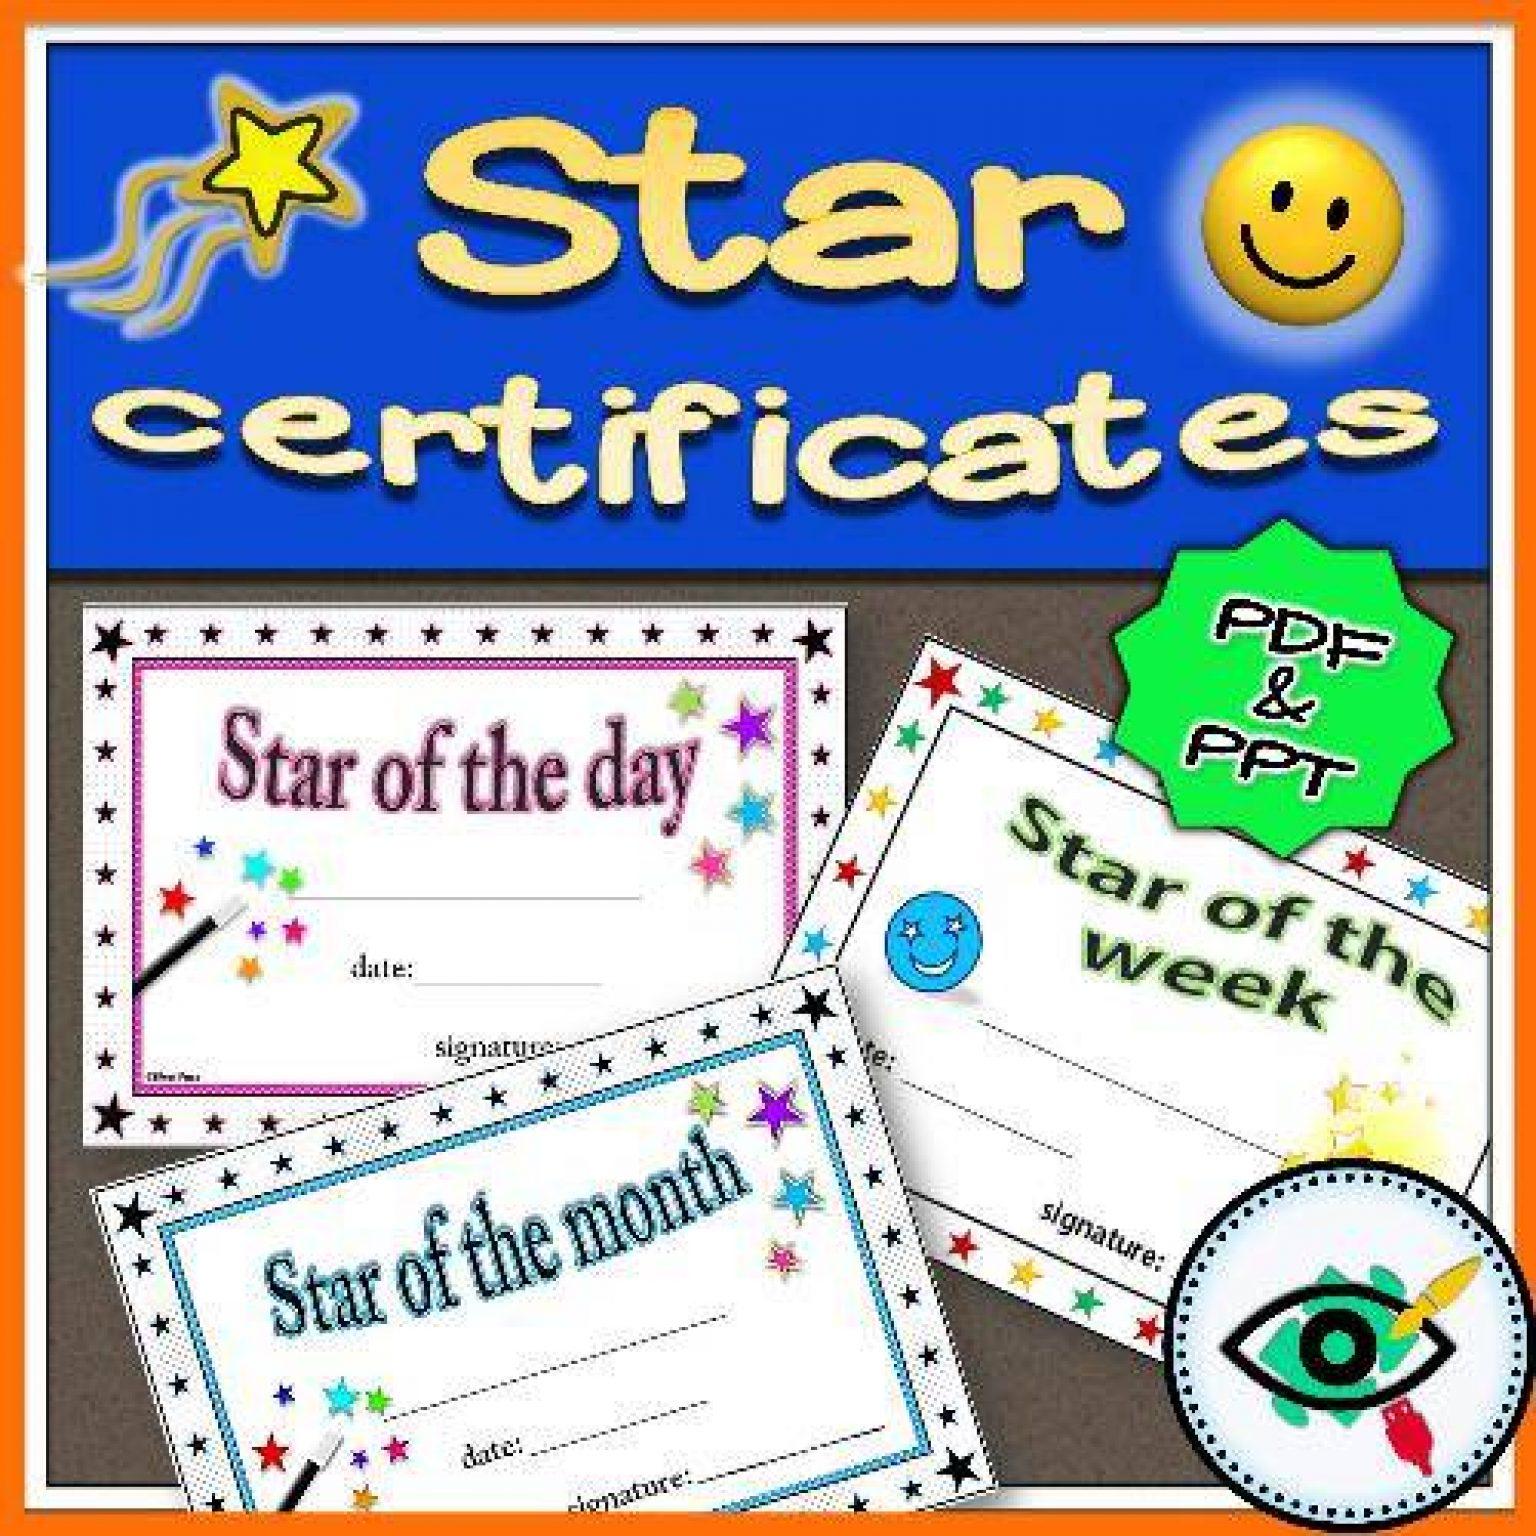 awards_rewards-star-certificates-g2-6-title_resized